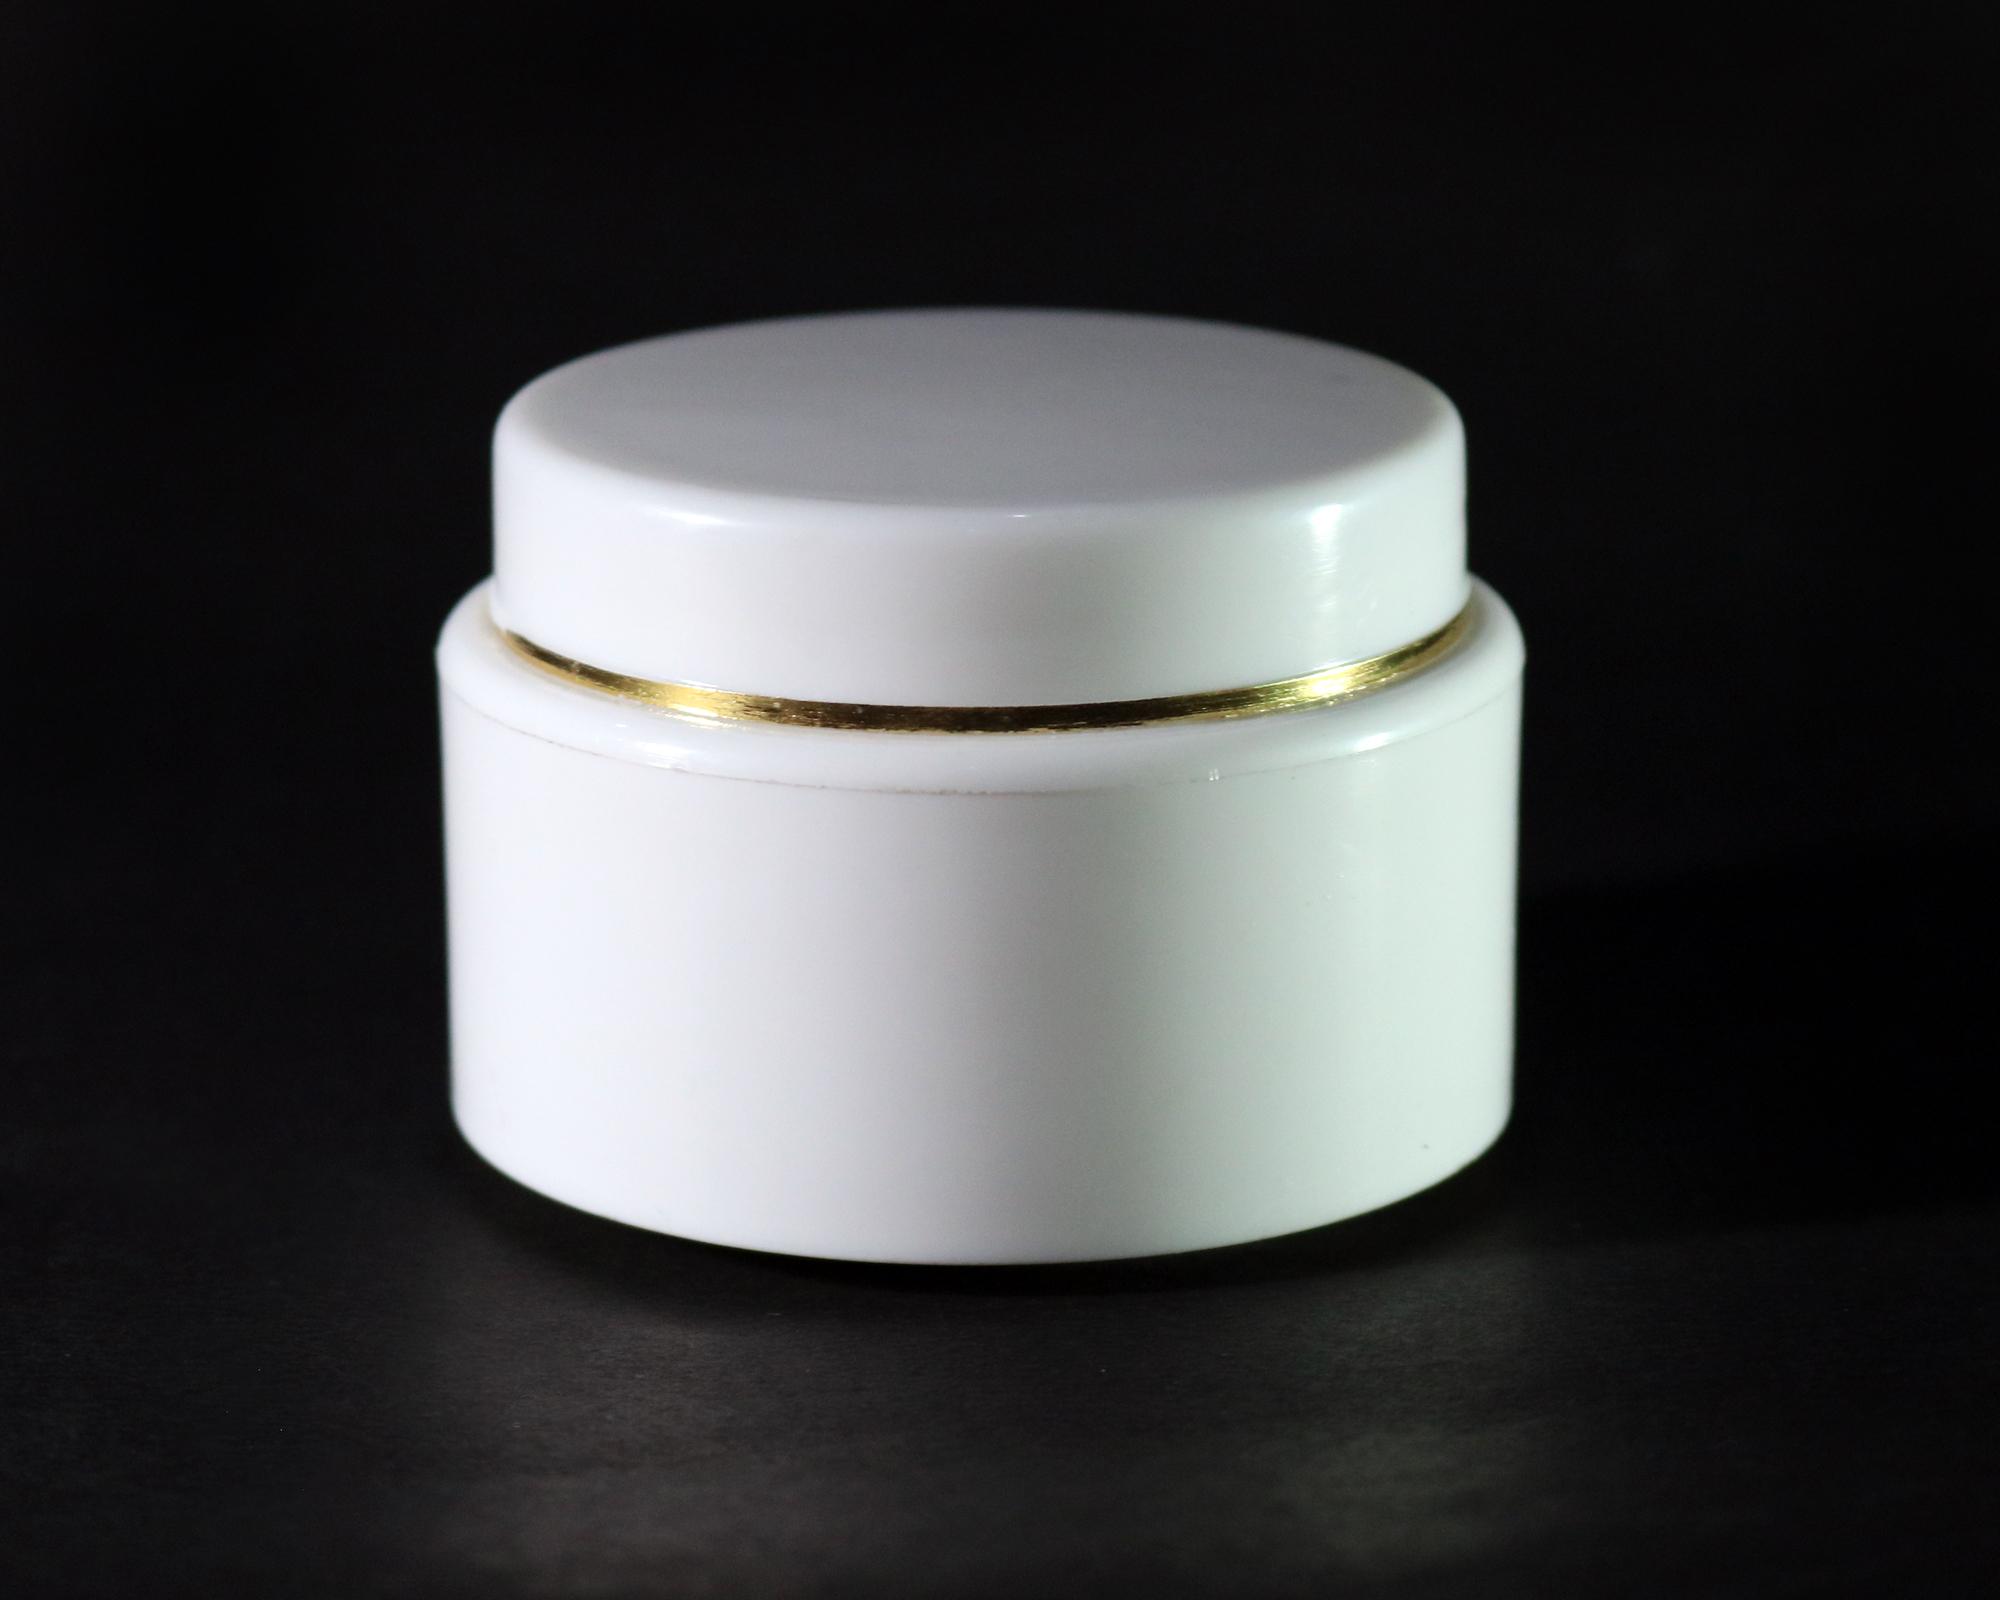 50 GM Double Wall Jar